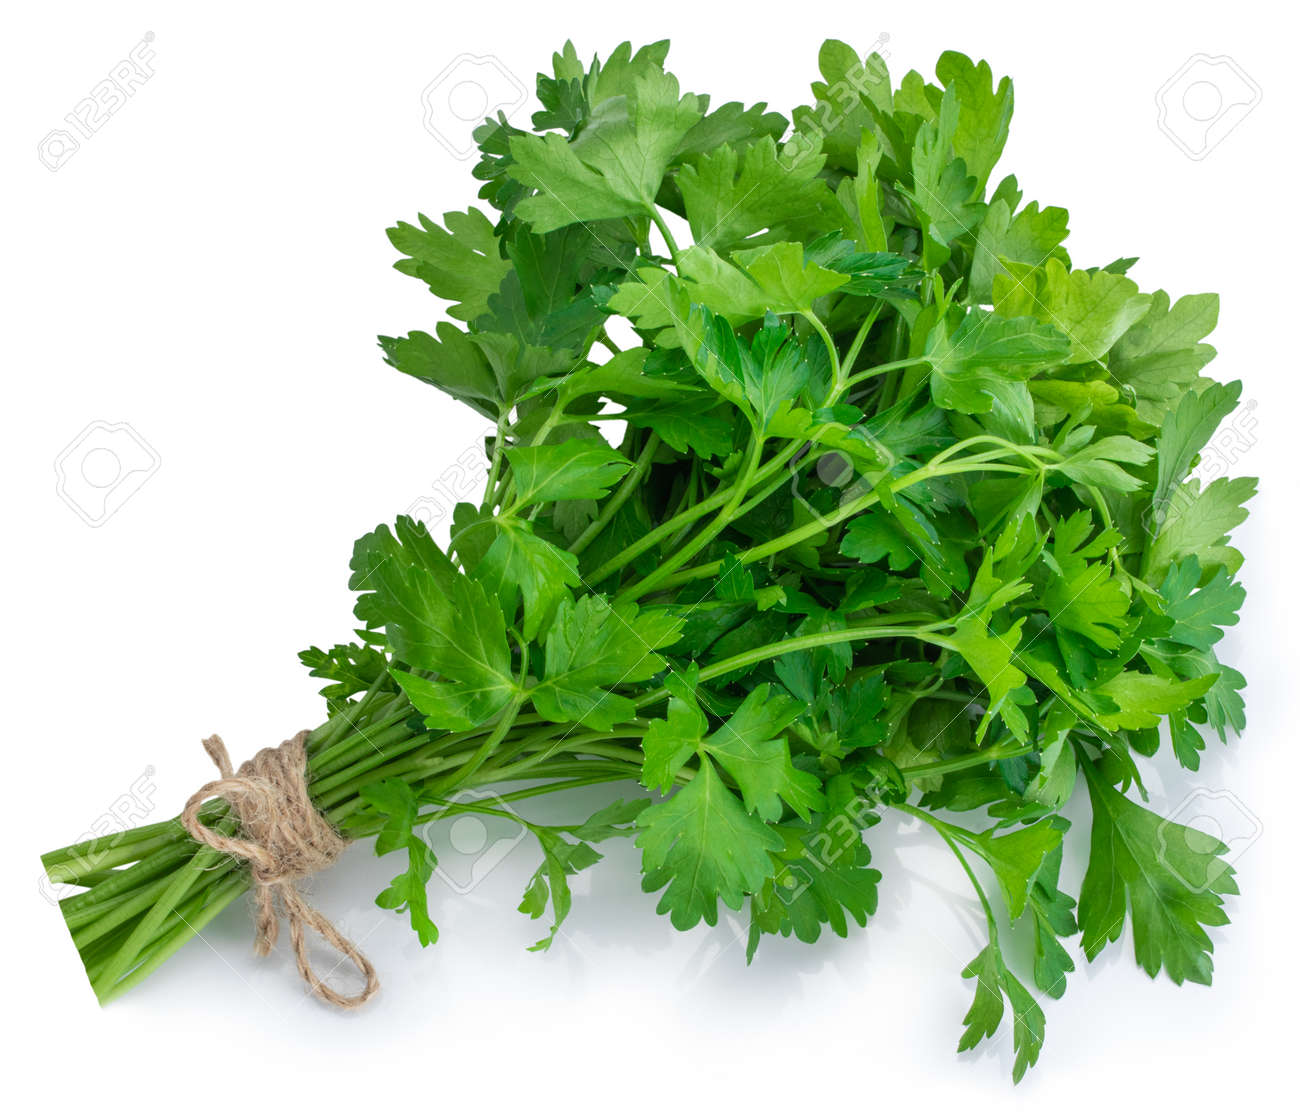 bunch fresh parsley isolated on white background. - 138394291